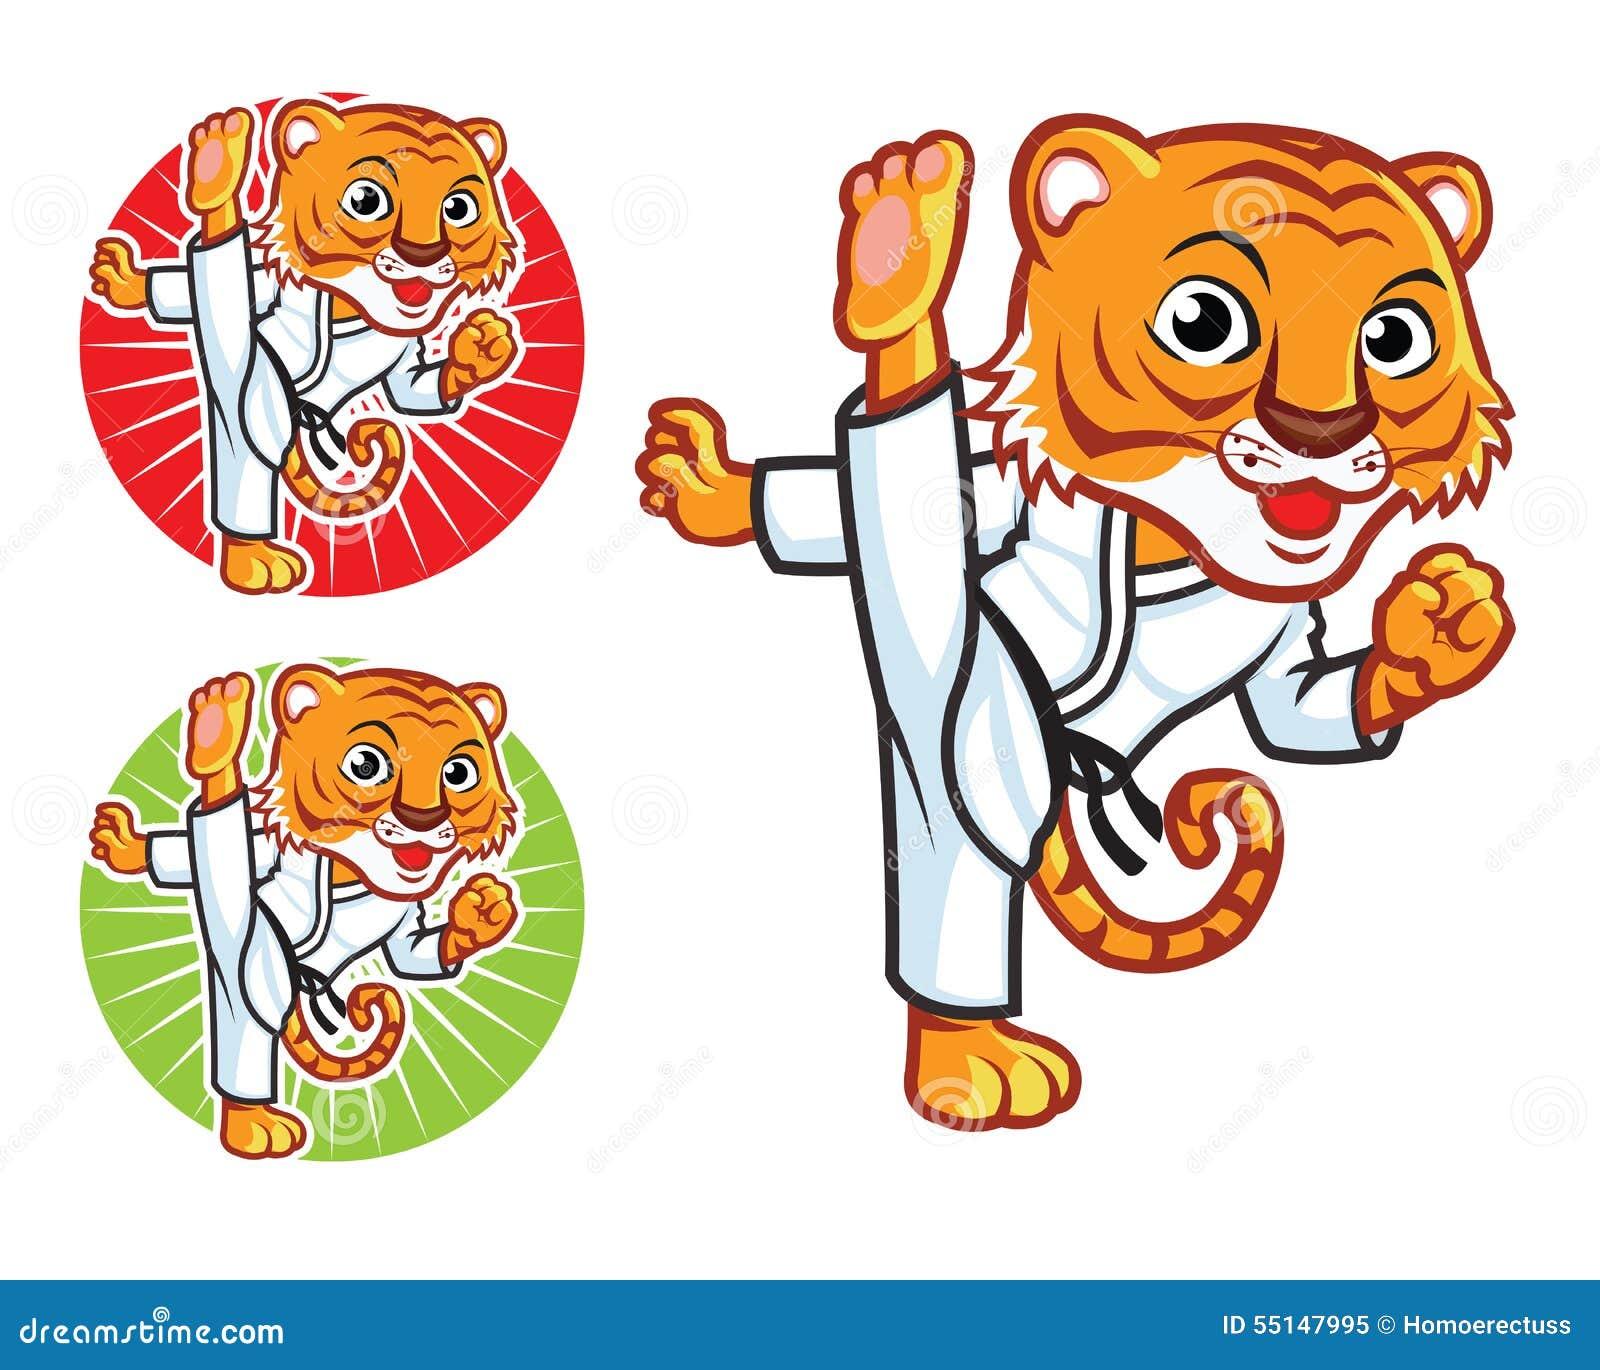 Vector Cartoon of Taekwondo Tiger Cartoon Mascot Showing Kick.